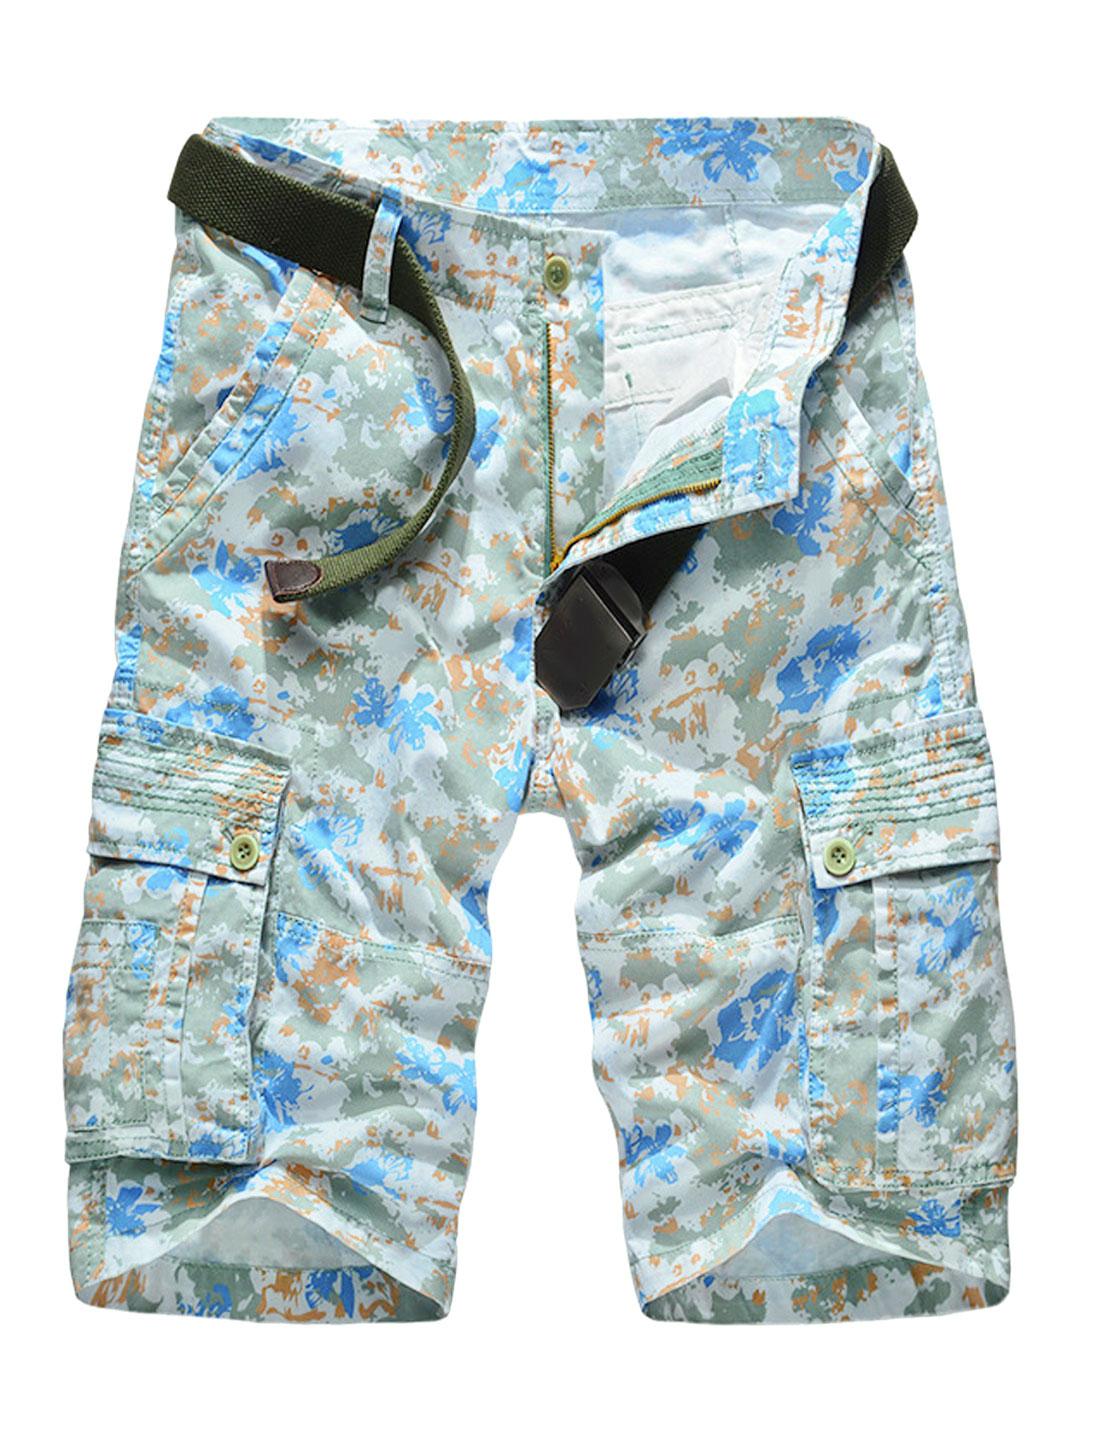 Men Floral Novelty Prints Multi-Pockets Cargo Shorts Light Blue W34